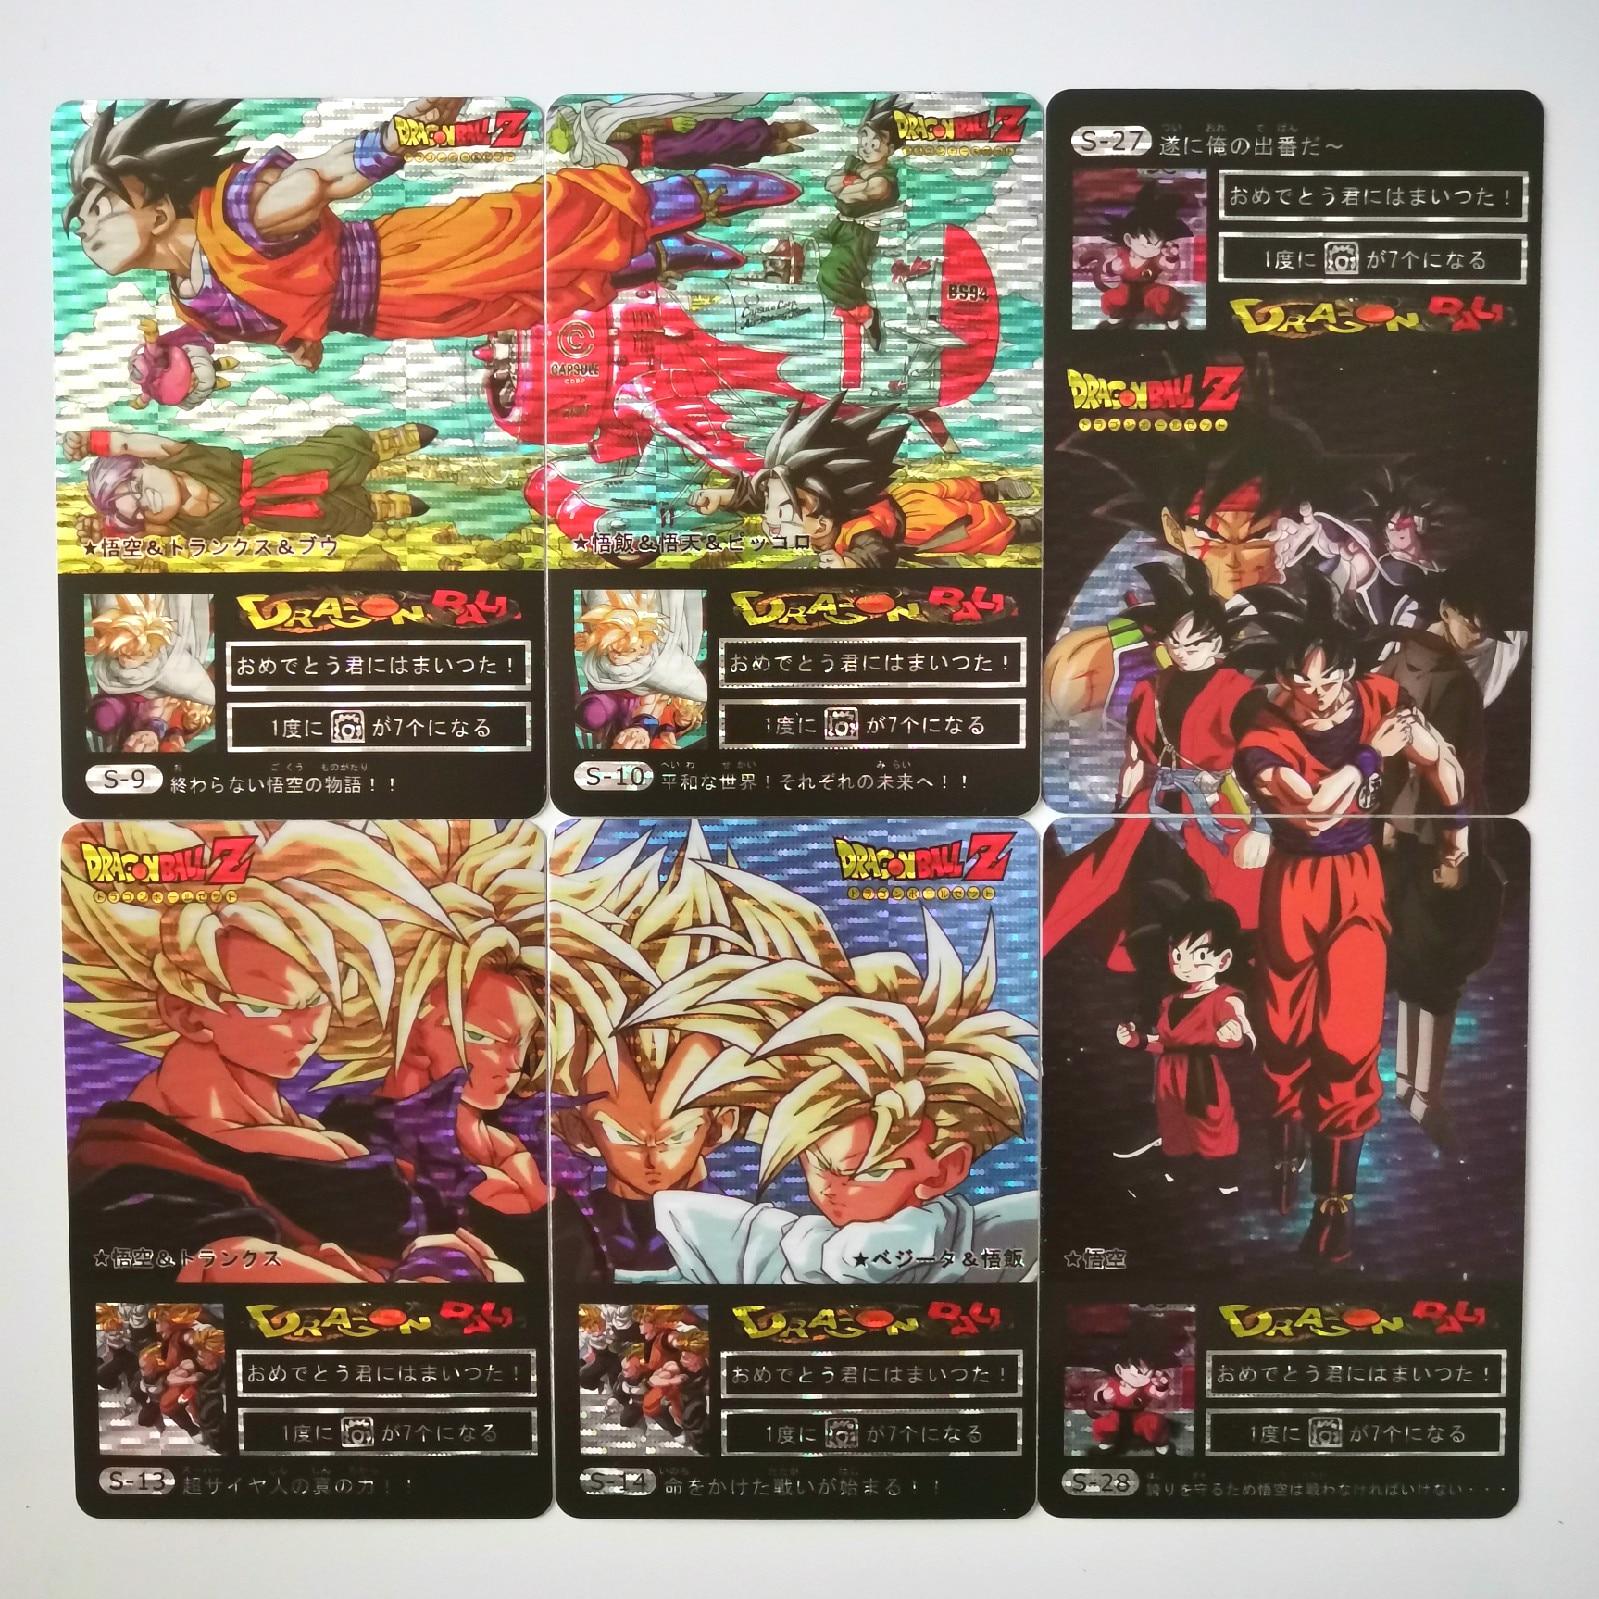 32pcs/set Super Dragon Ball Heroes Battle Card Ultra Instinct Goku Vegeta Game Collection Double Chess Anime Cards